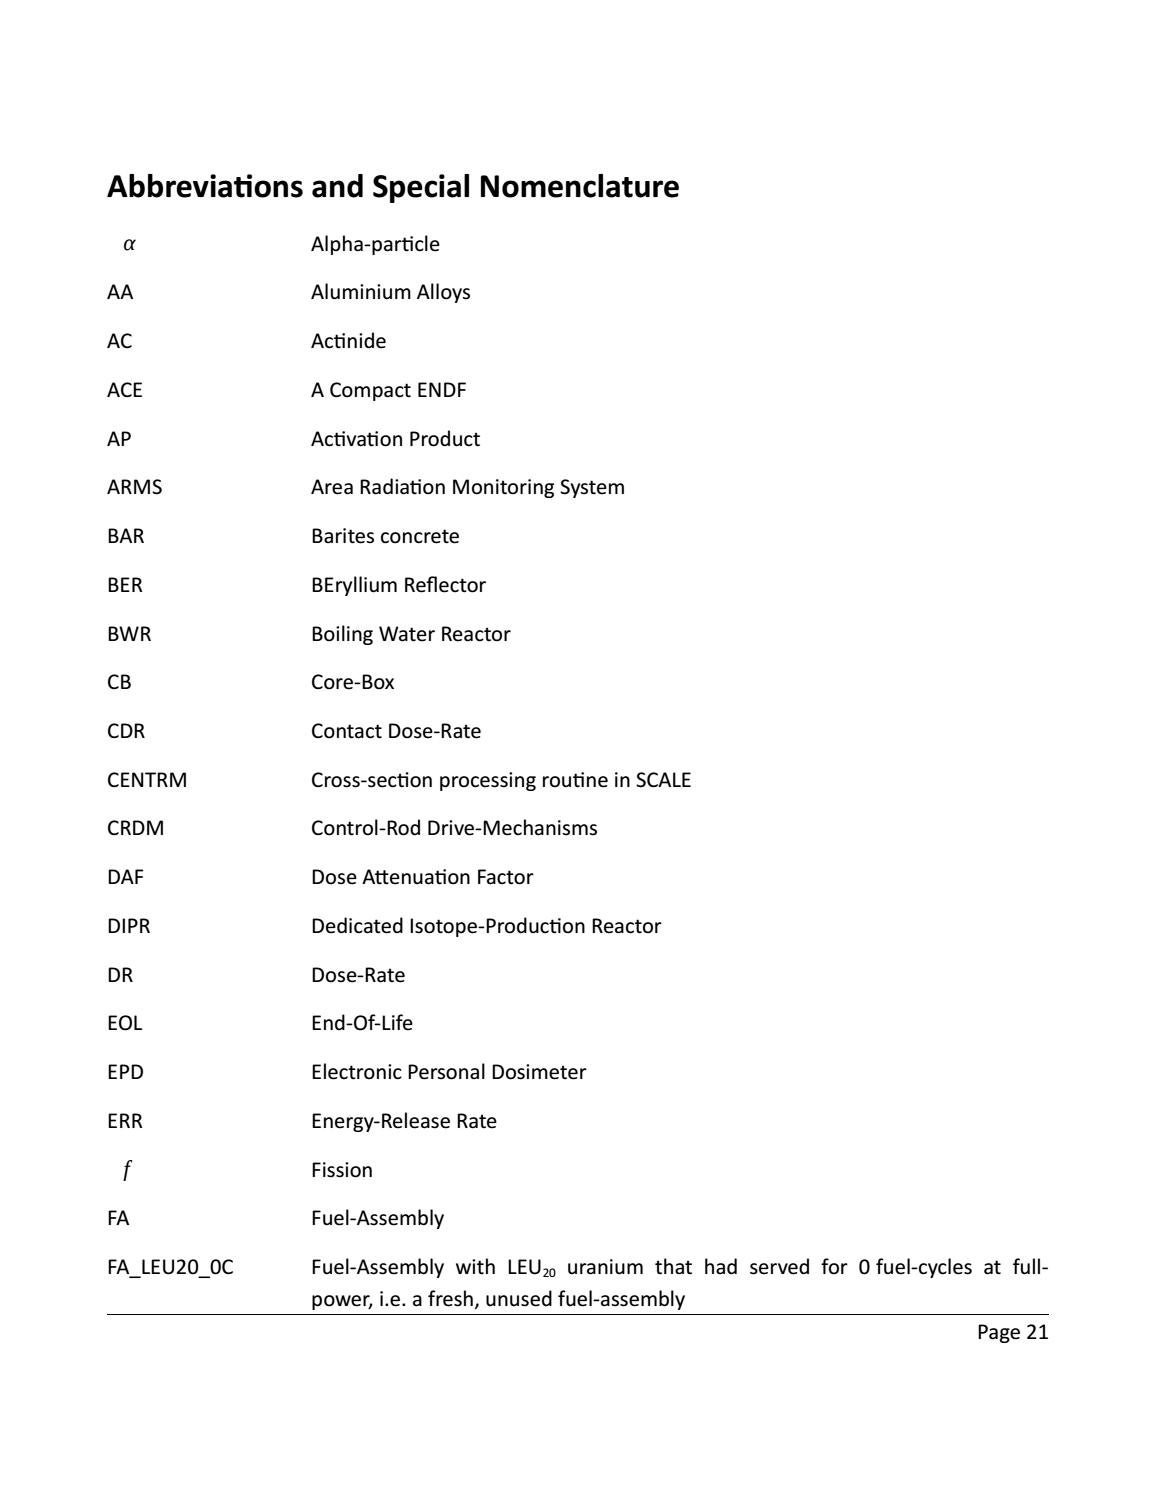 RADIOACTIVE WASTE: COMPUTATIONAL CHARACTERISATION and SHIELDING page 21